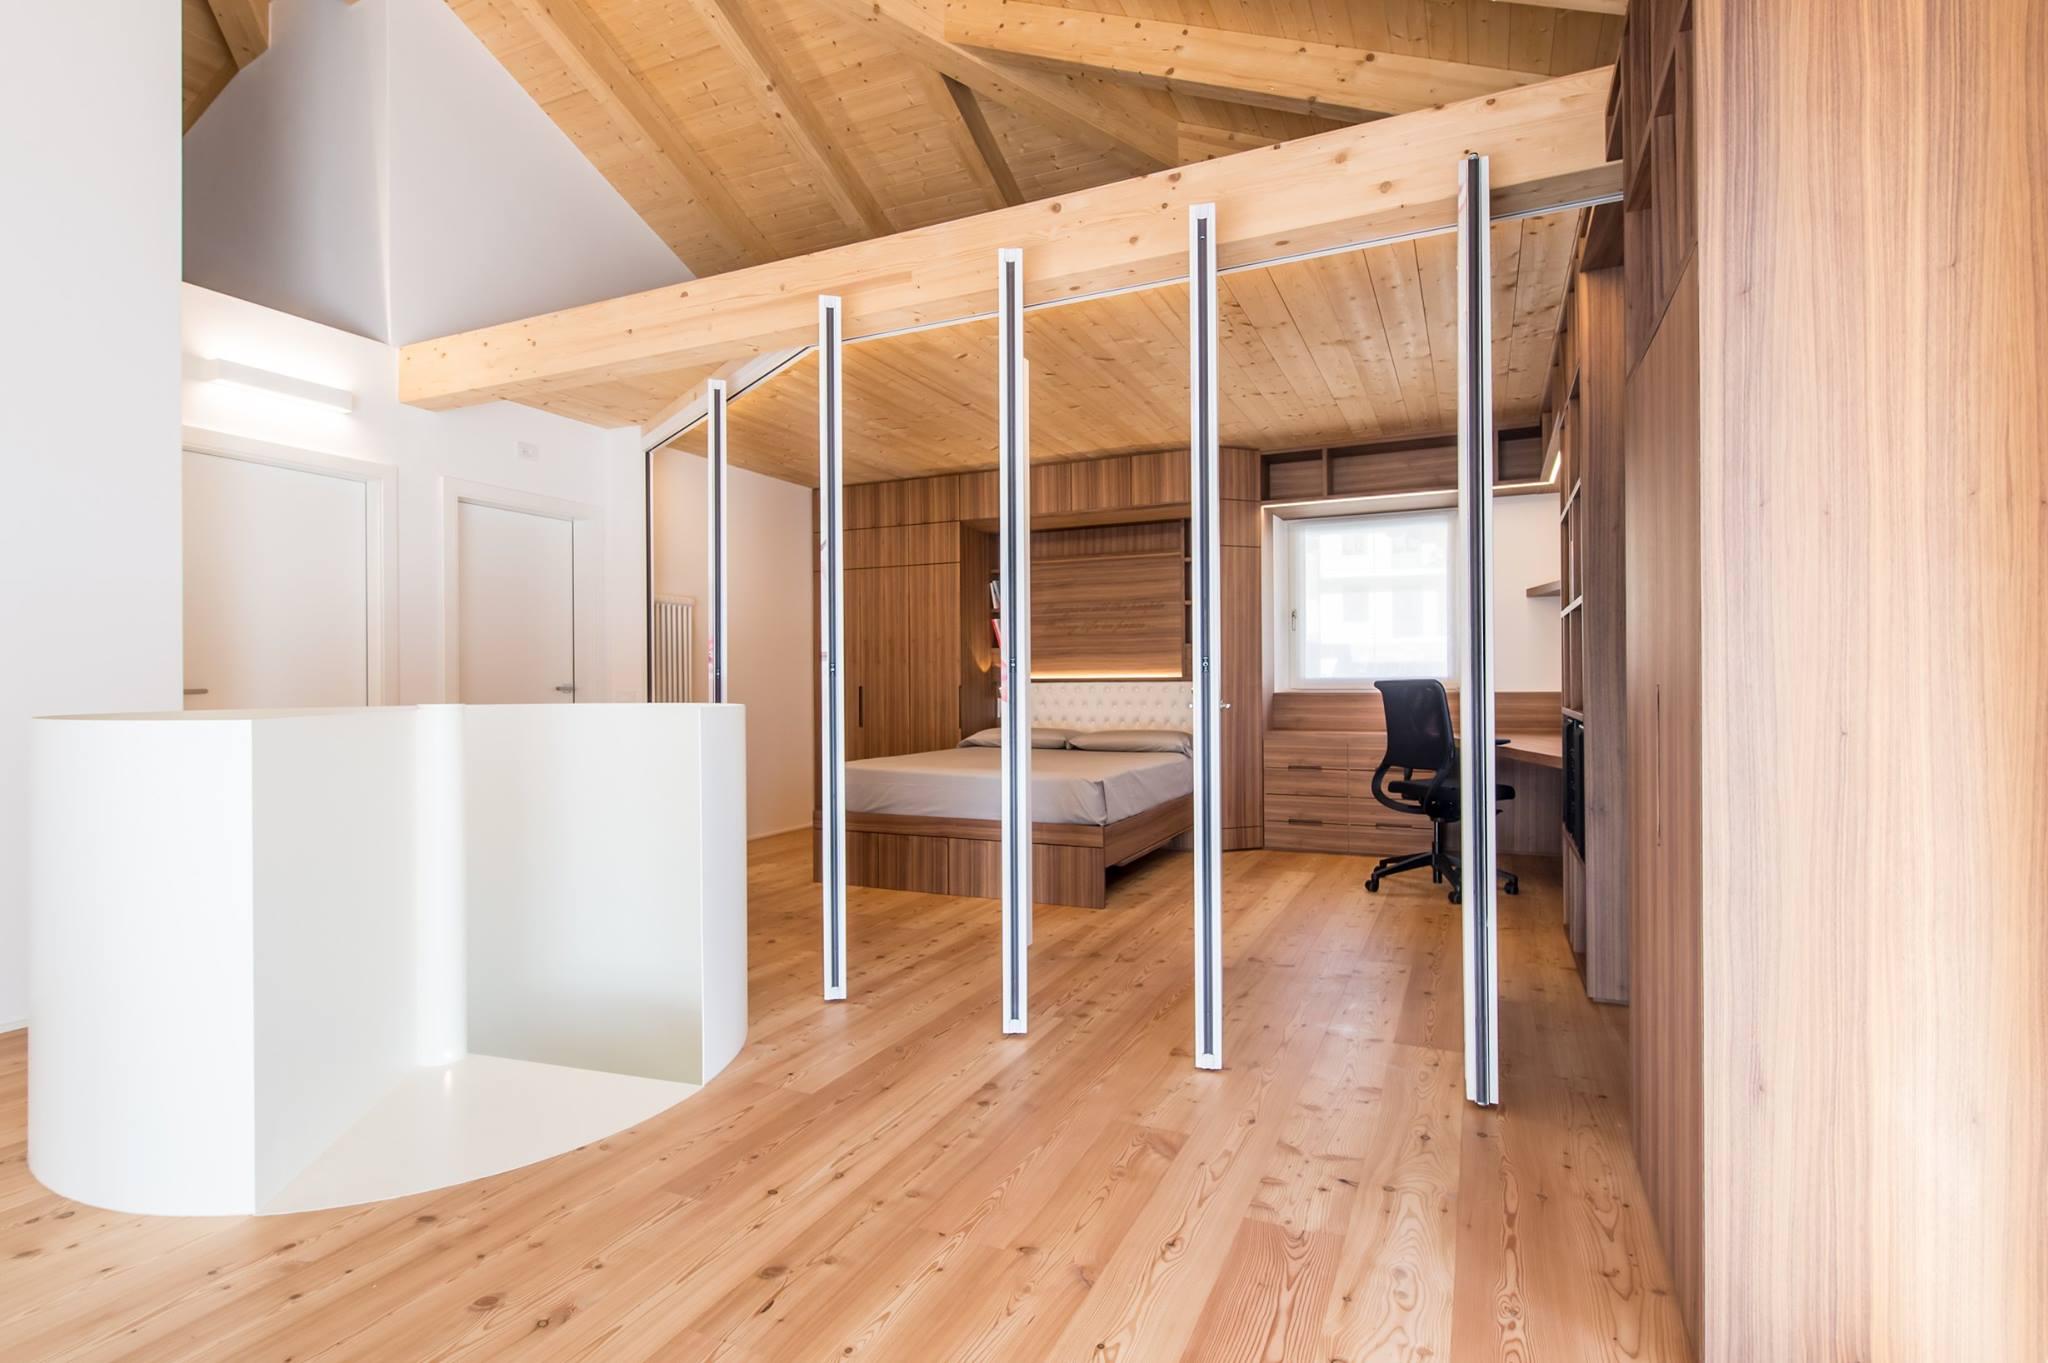 Pareti Divisorie Mobili Per Casa : Pareti divisorie mobili